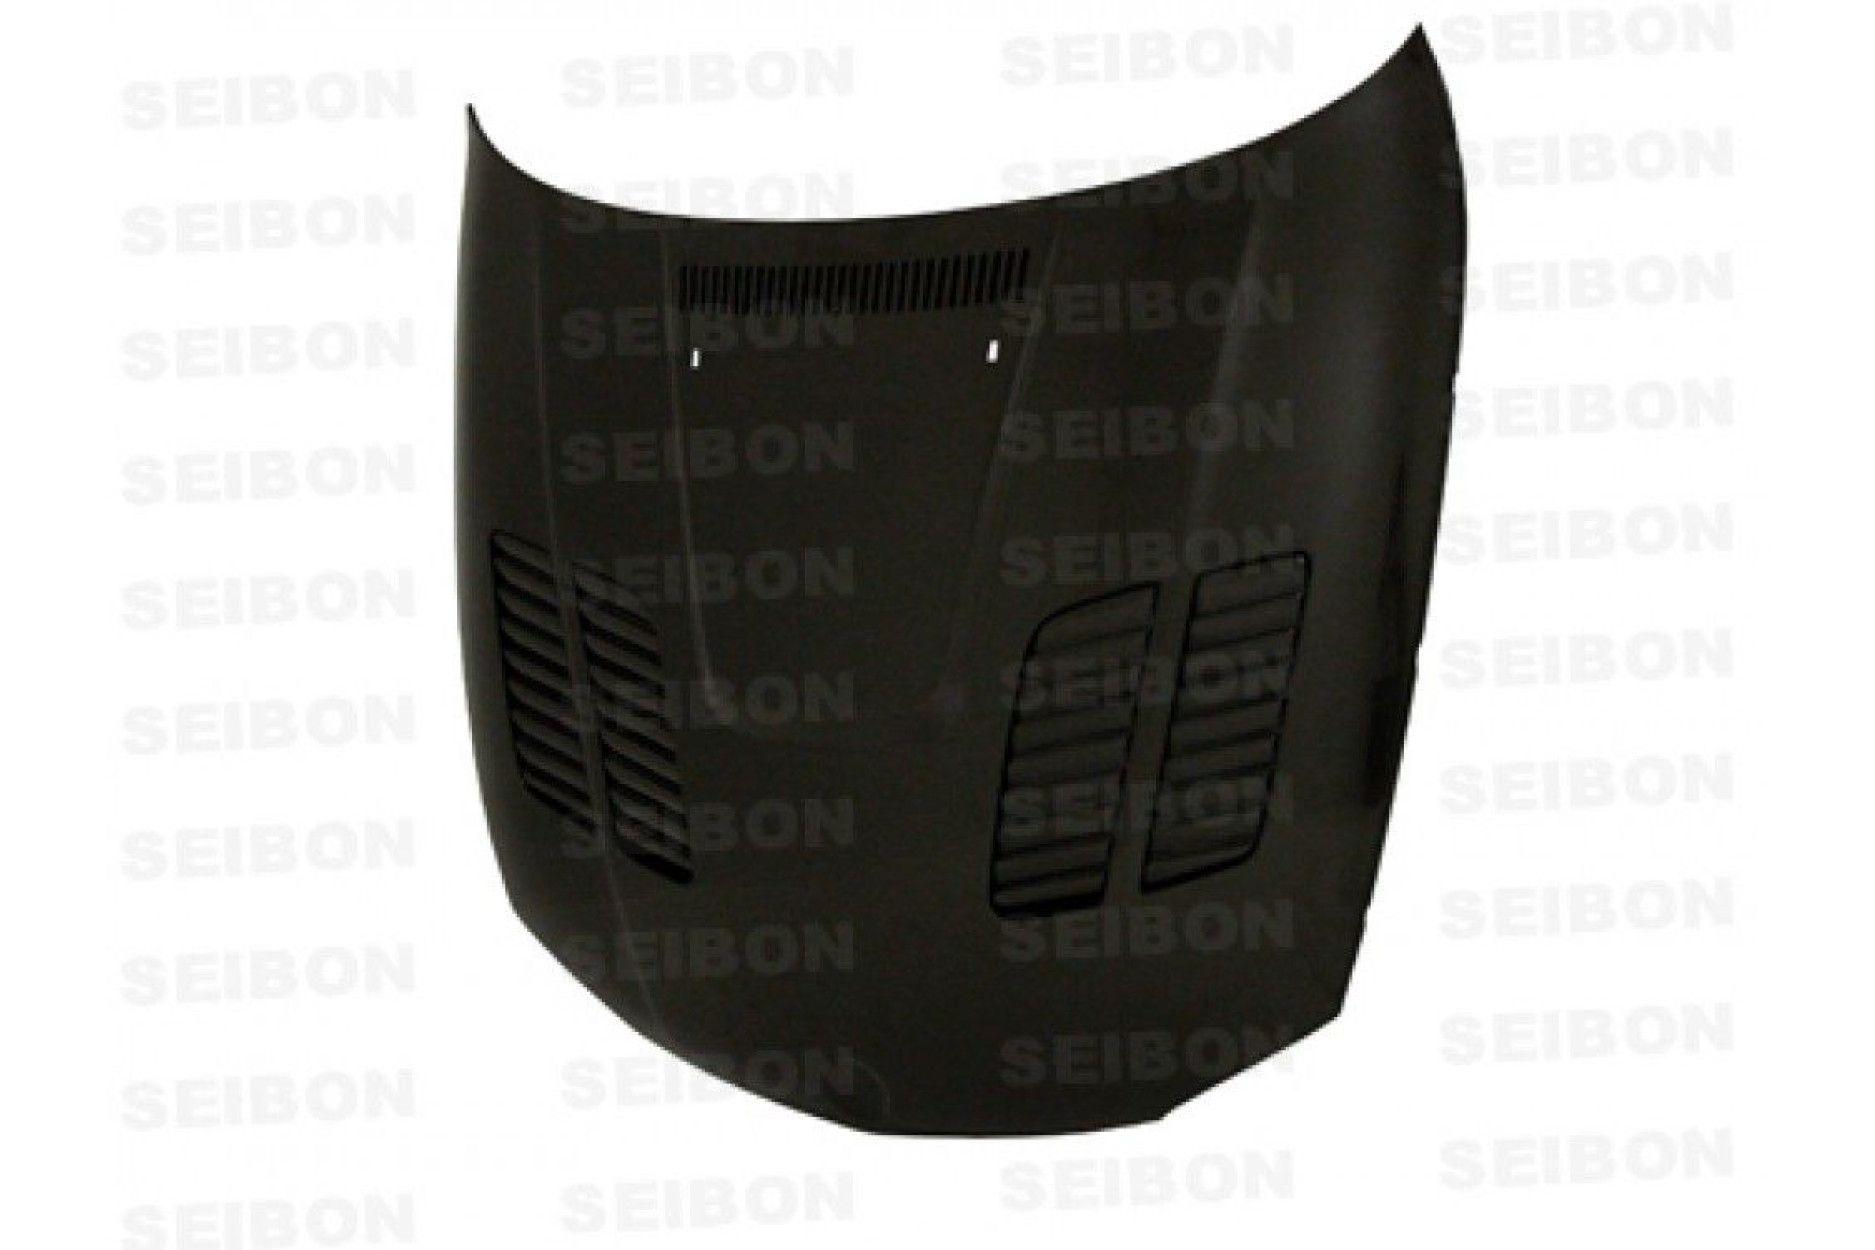 Seibon Carbon Motorhaube für BMW 1er E81|E82|E87|E88 und 1M Coupé 2008 - 2012 GTR-Style